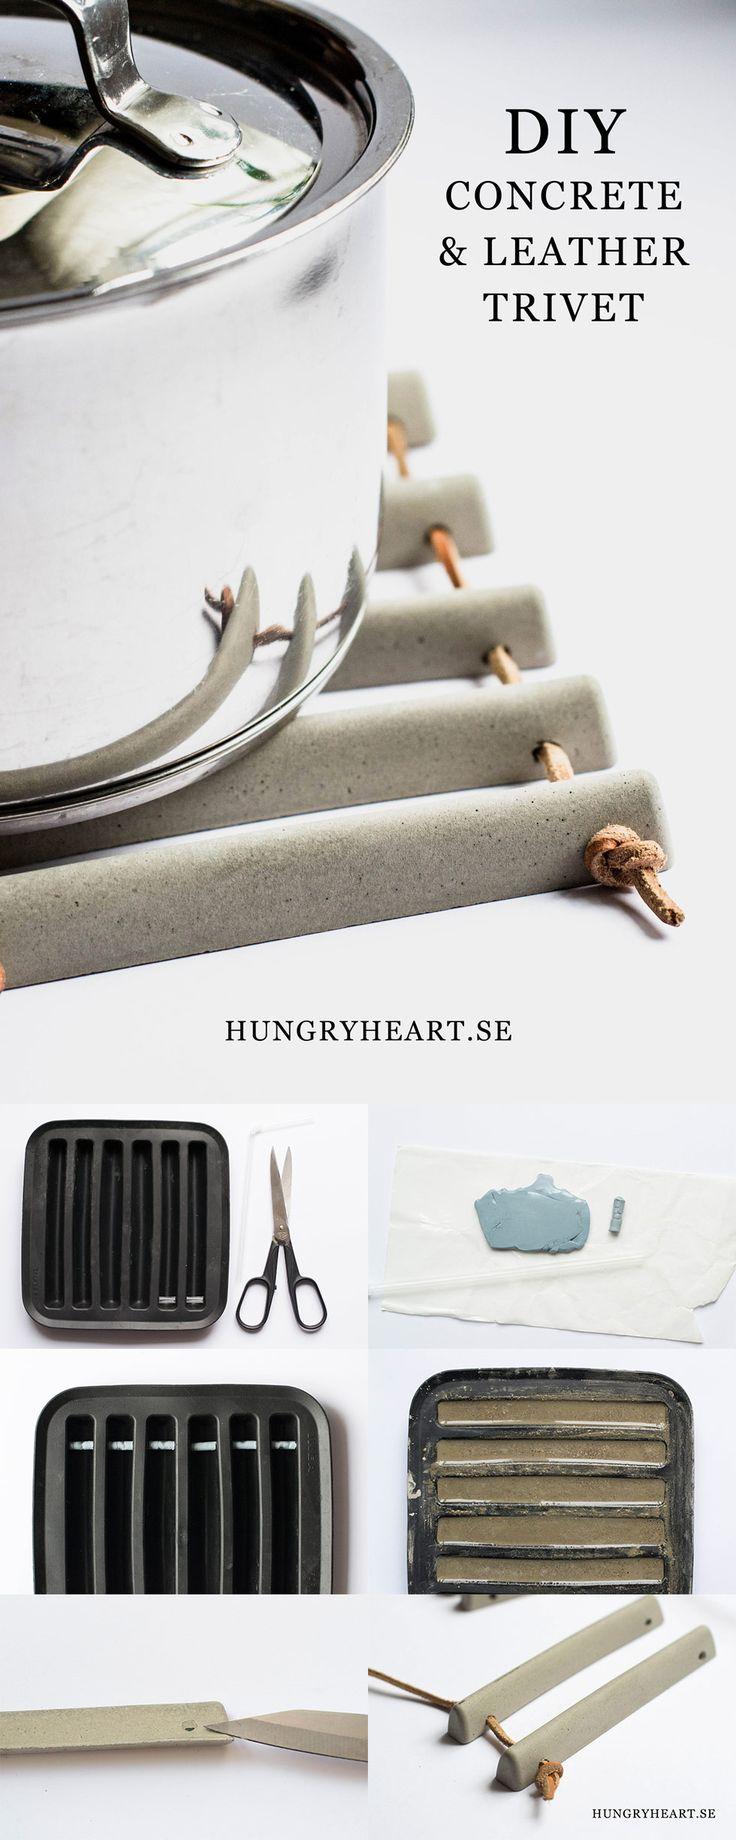 DIY Concrete Trivet Tutorial | Hungry Heart DIY Topfuntersetzer Design Beton selbermachen